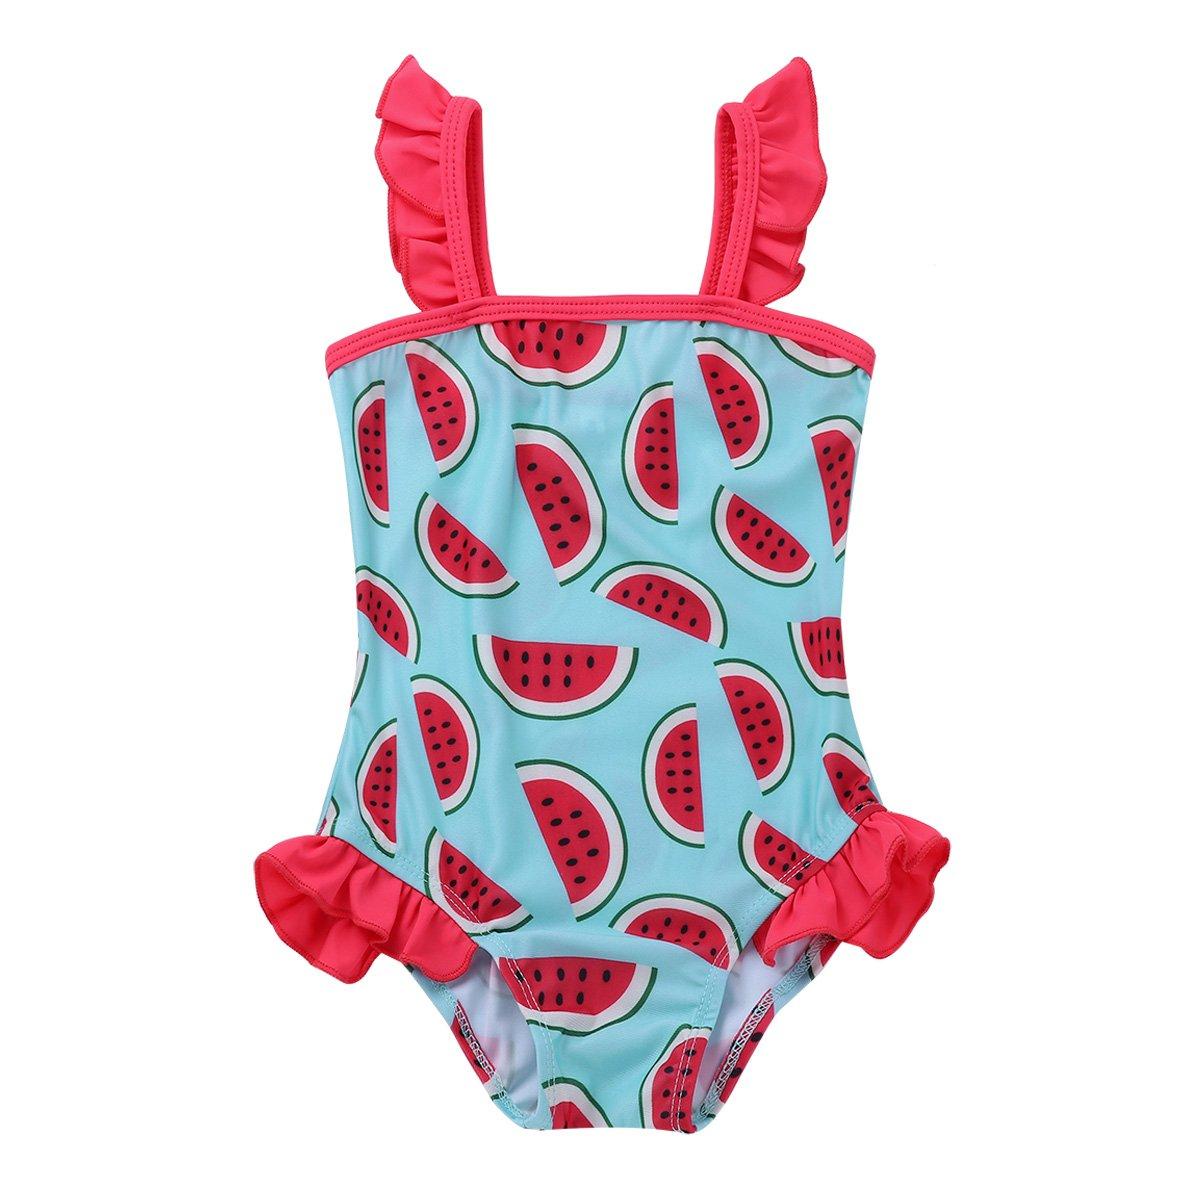 3e613a3571360 Freebily Infant Baby Girls One-Piece Cute Watermelon Printed Ruffle  Swimsuit Swimwear Swimming Costumes: Amazon.co.uk: Clothing